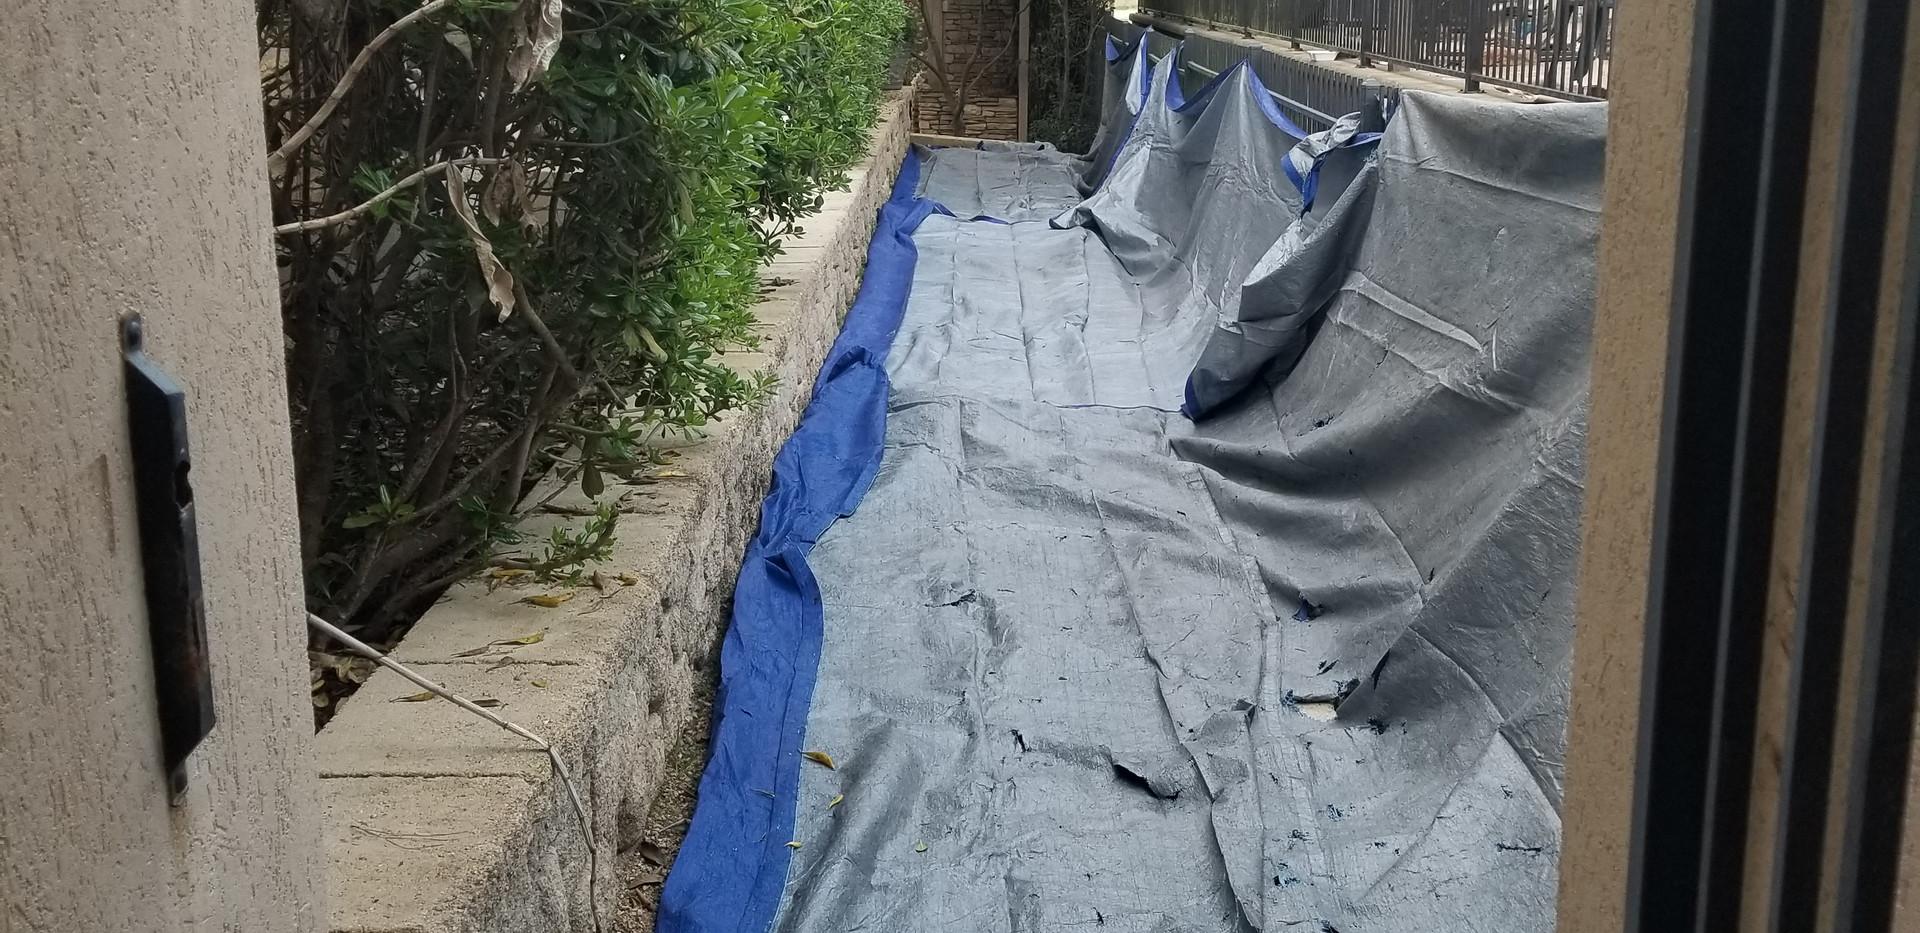 Utilizing tarps to catch falling debris